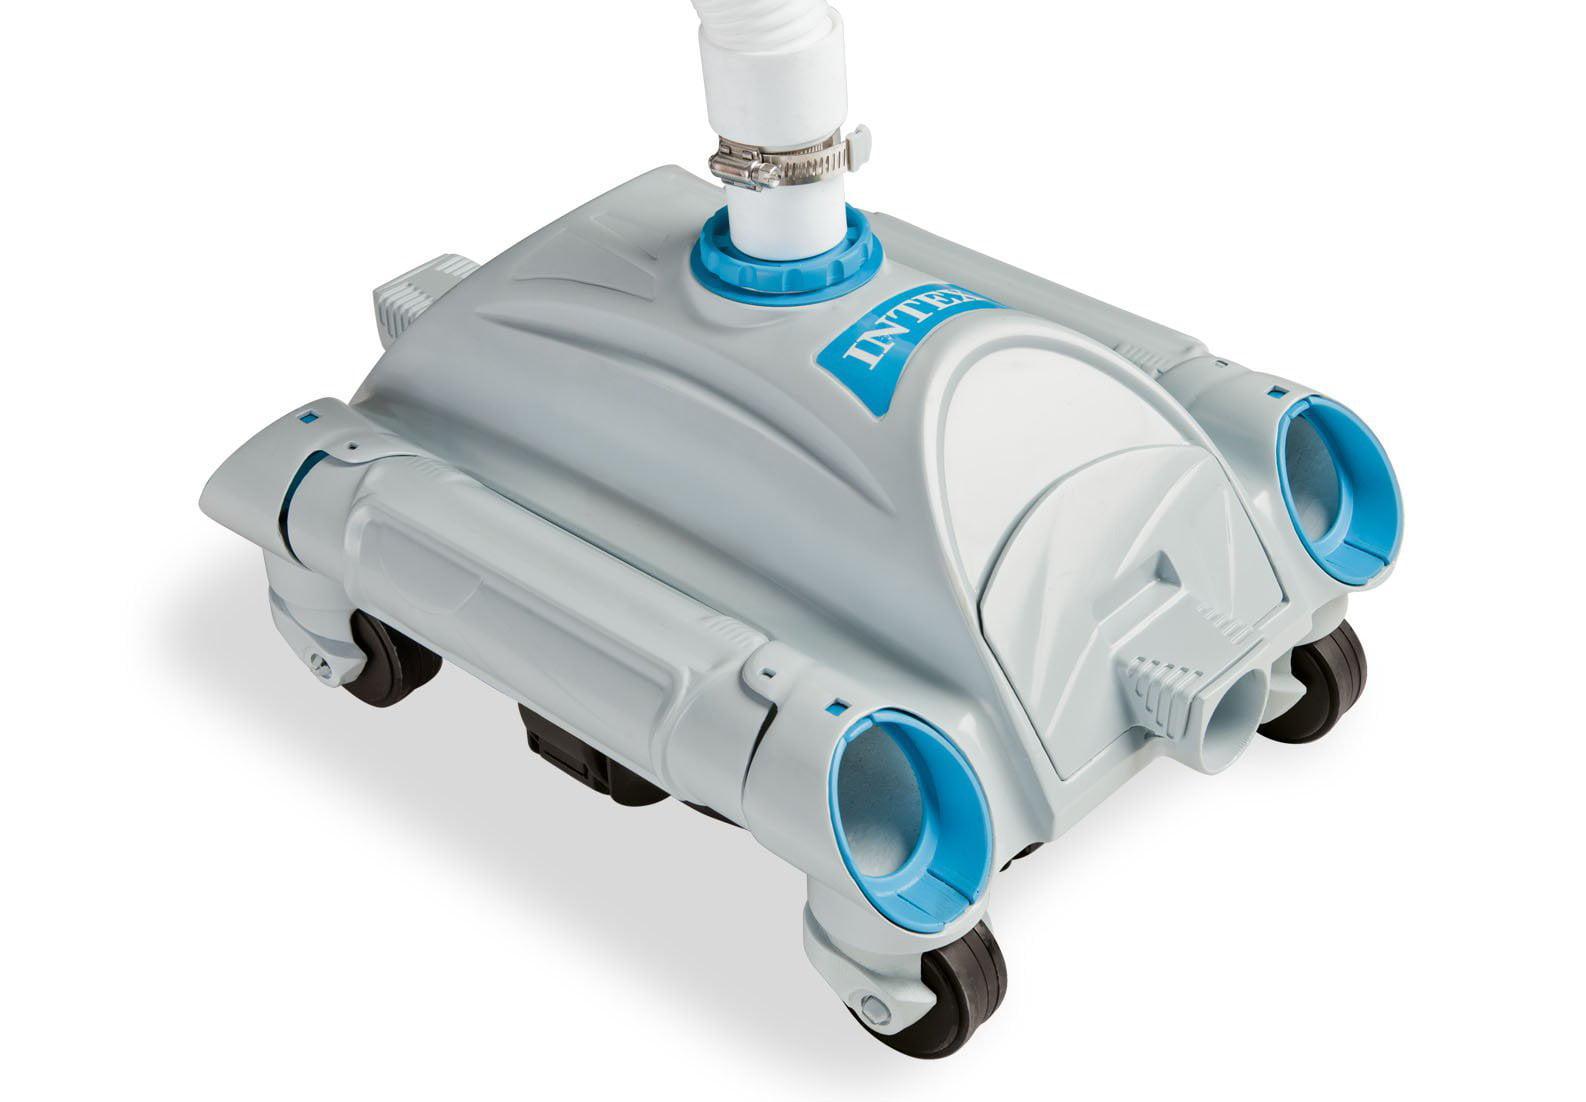 Intex Automatic Above Ground Swimming Pool Vacuum Cleaner, 28001E -  Walmart.com